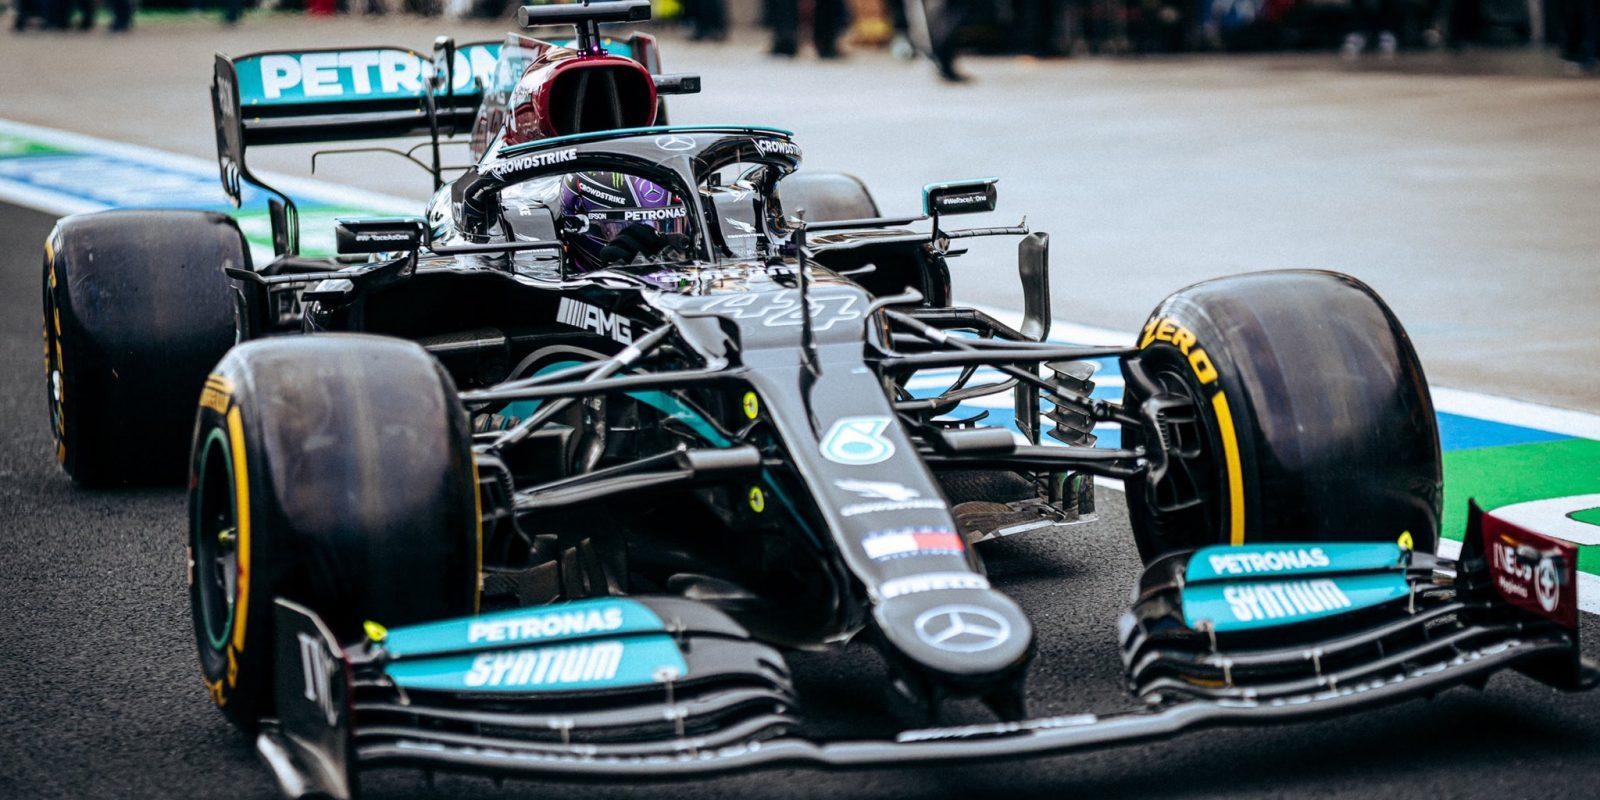 Kvalifikaci ovládl Hamilton, Schumacher se dostal do Q2!